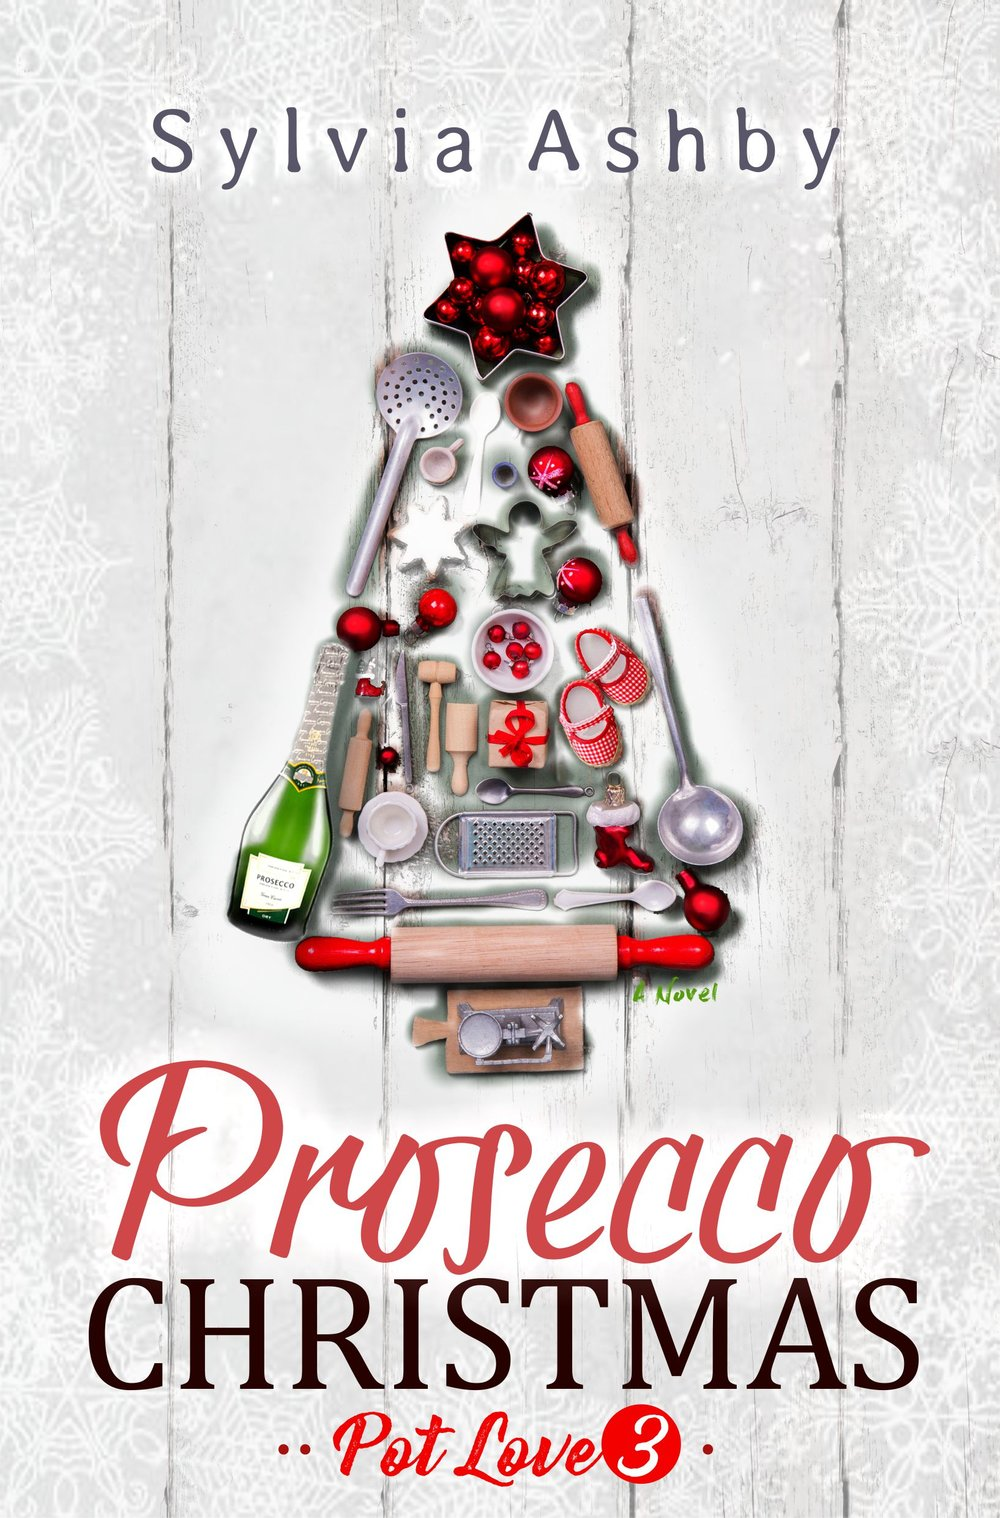 Prosecco Christmas.jpg